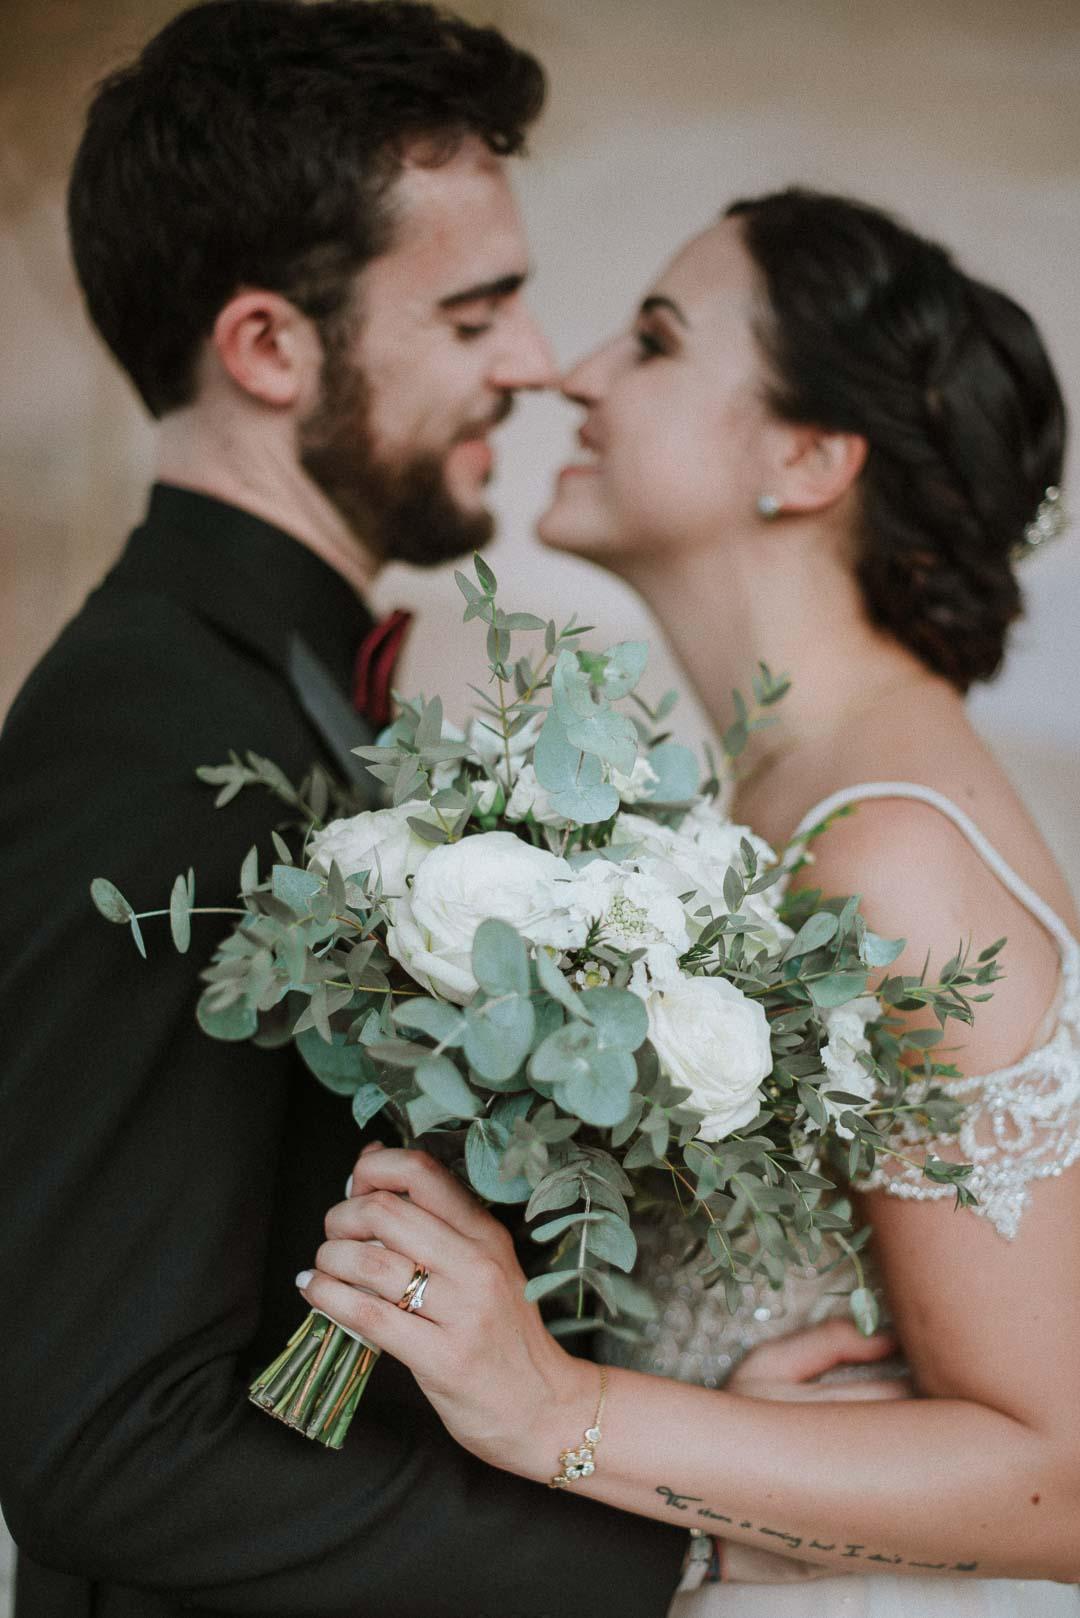 wedding-photographer-destination-fineart-bespoke-reportage-tuscany-villascorzi-vivianeizzo-spazio46-94